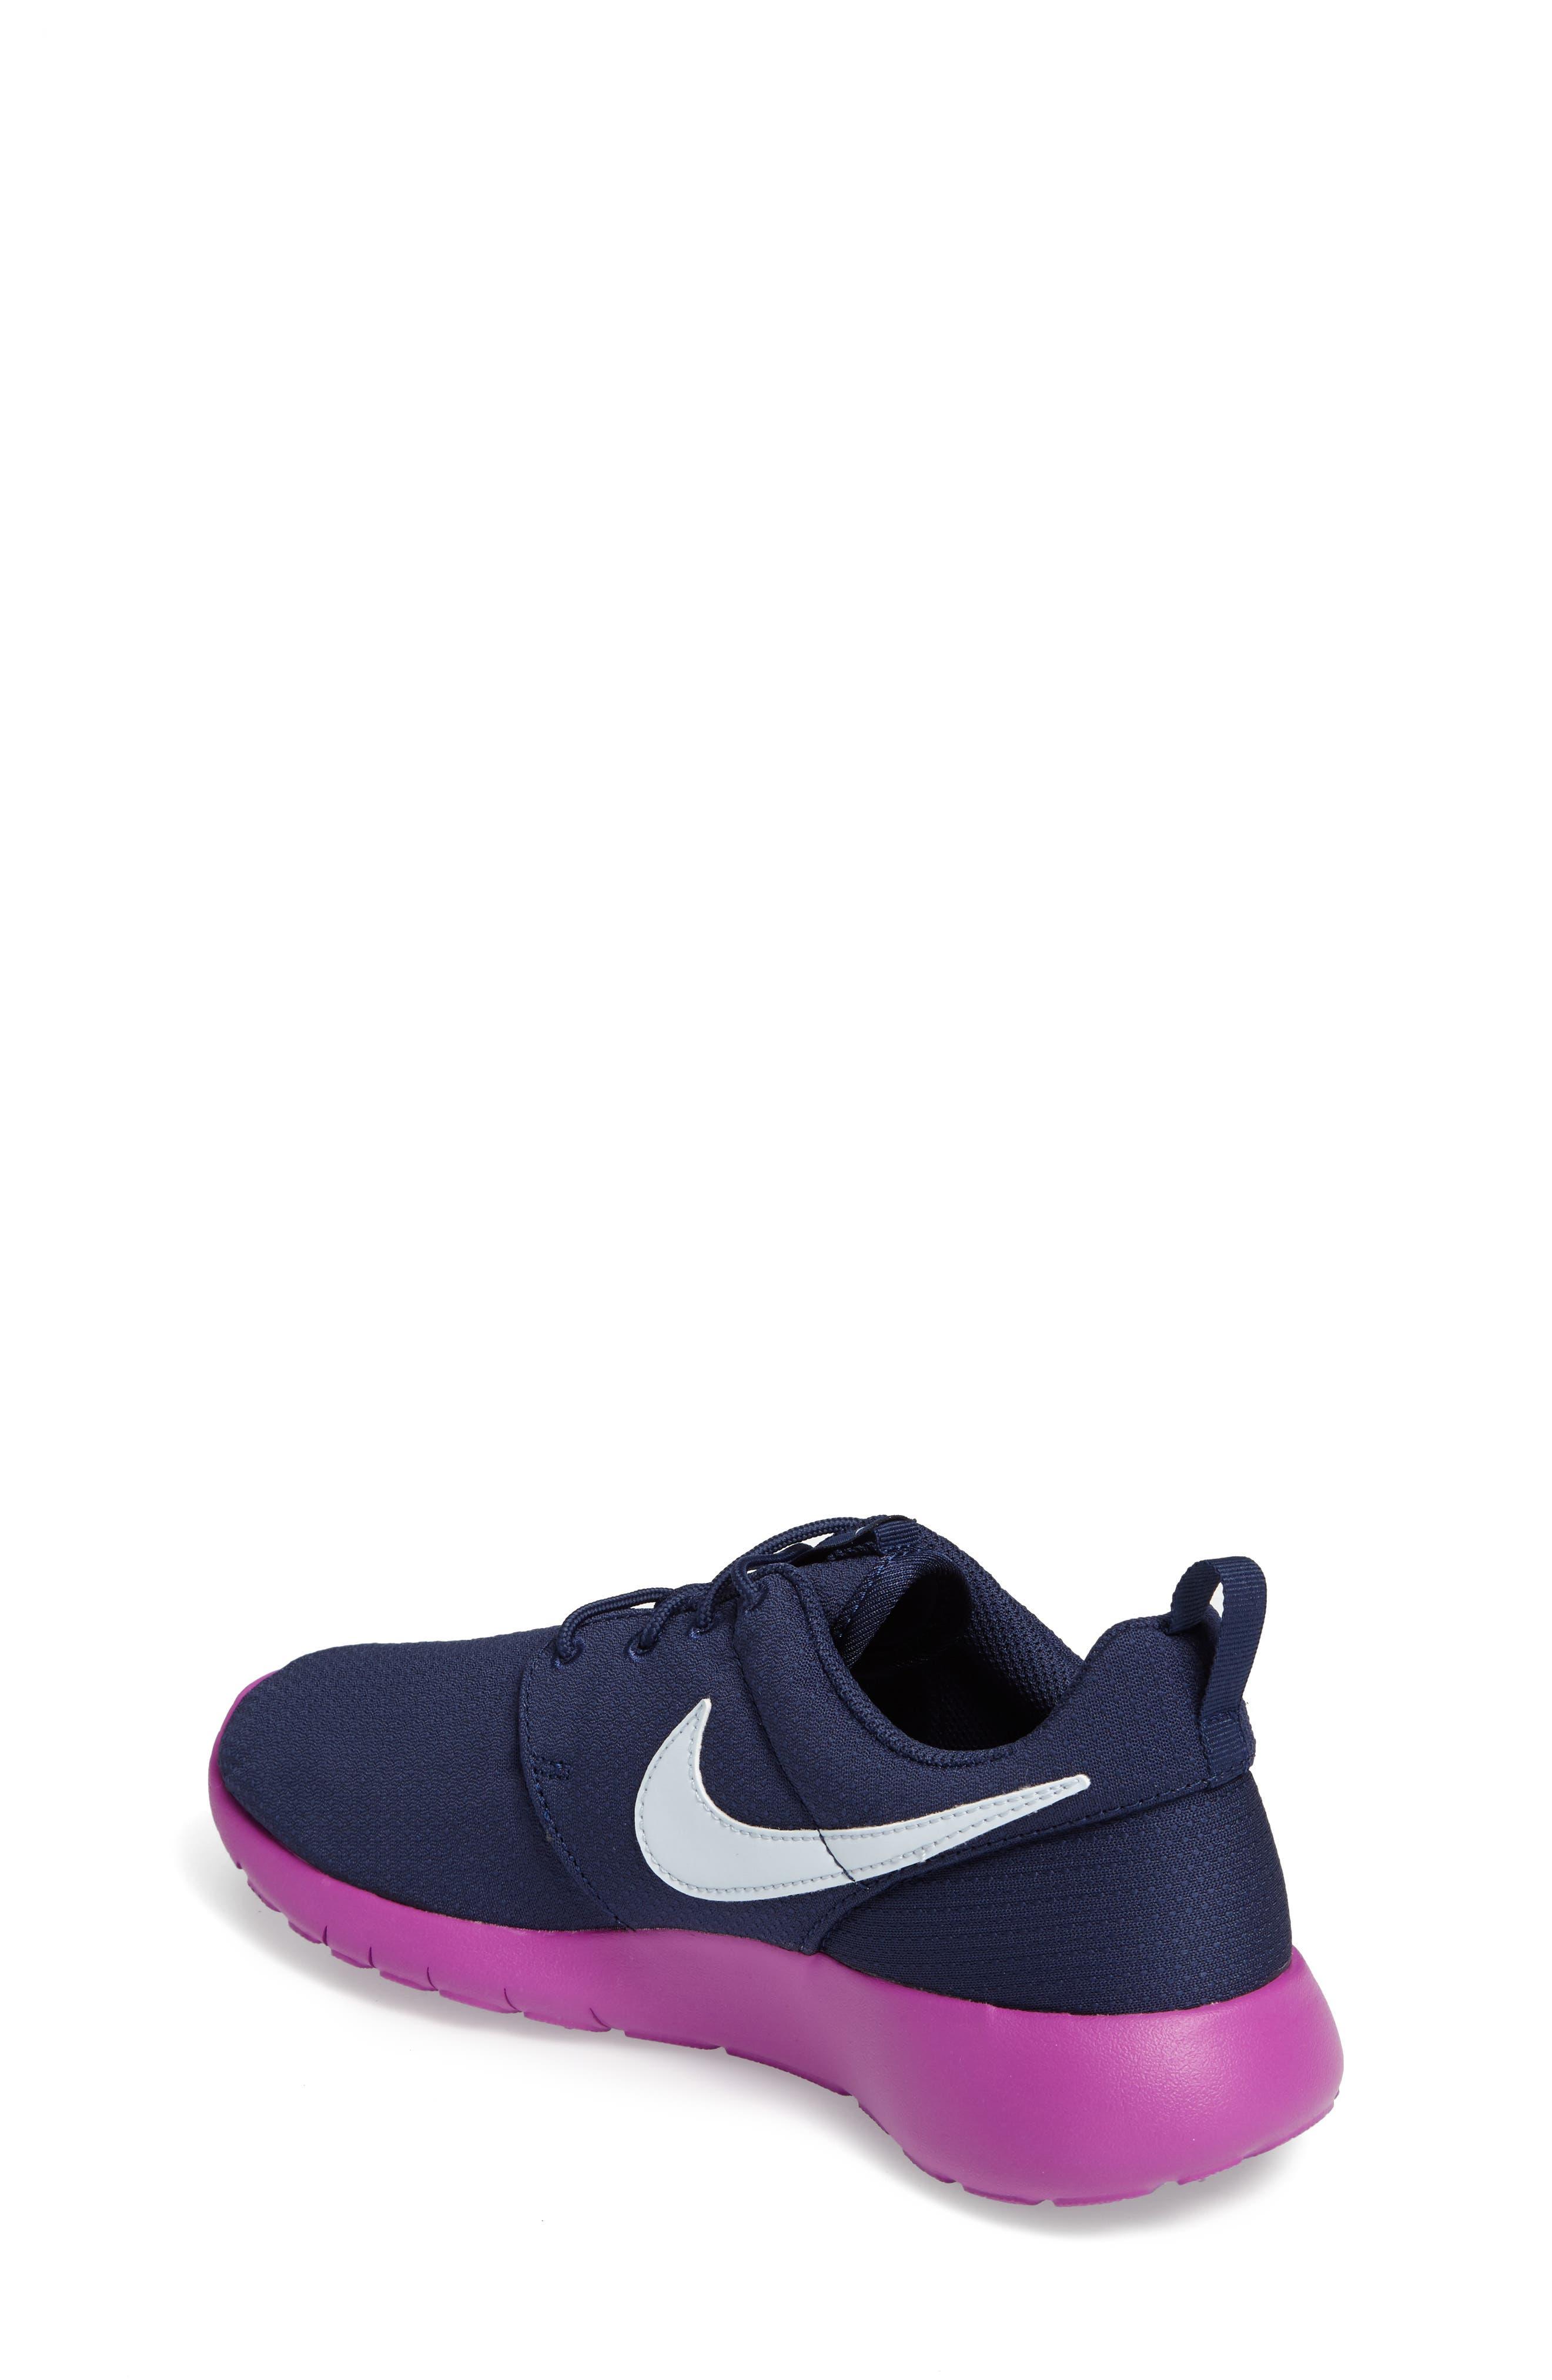 'Roshe Run' Athletic Shoe,                             Alternate thumbnail 133, color,